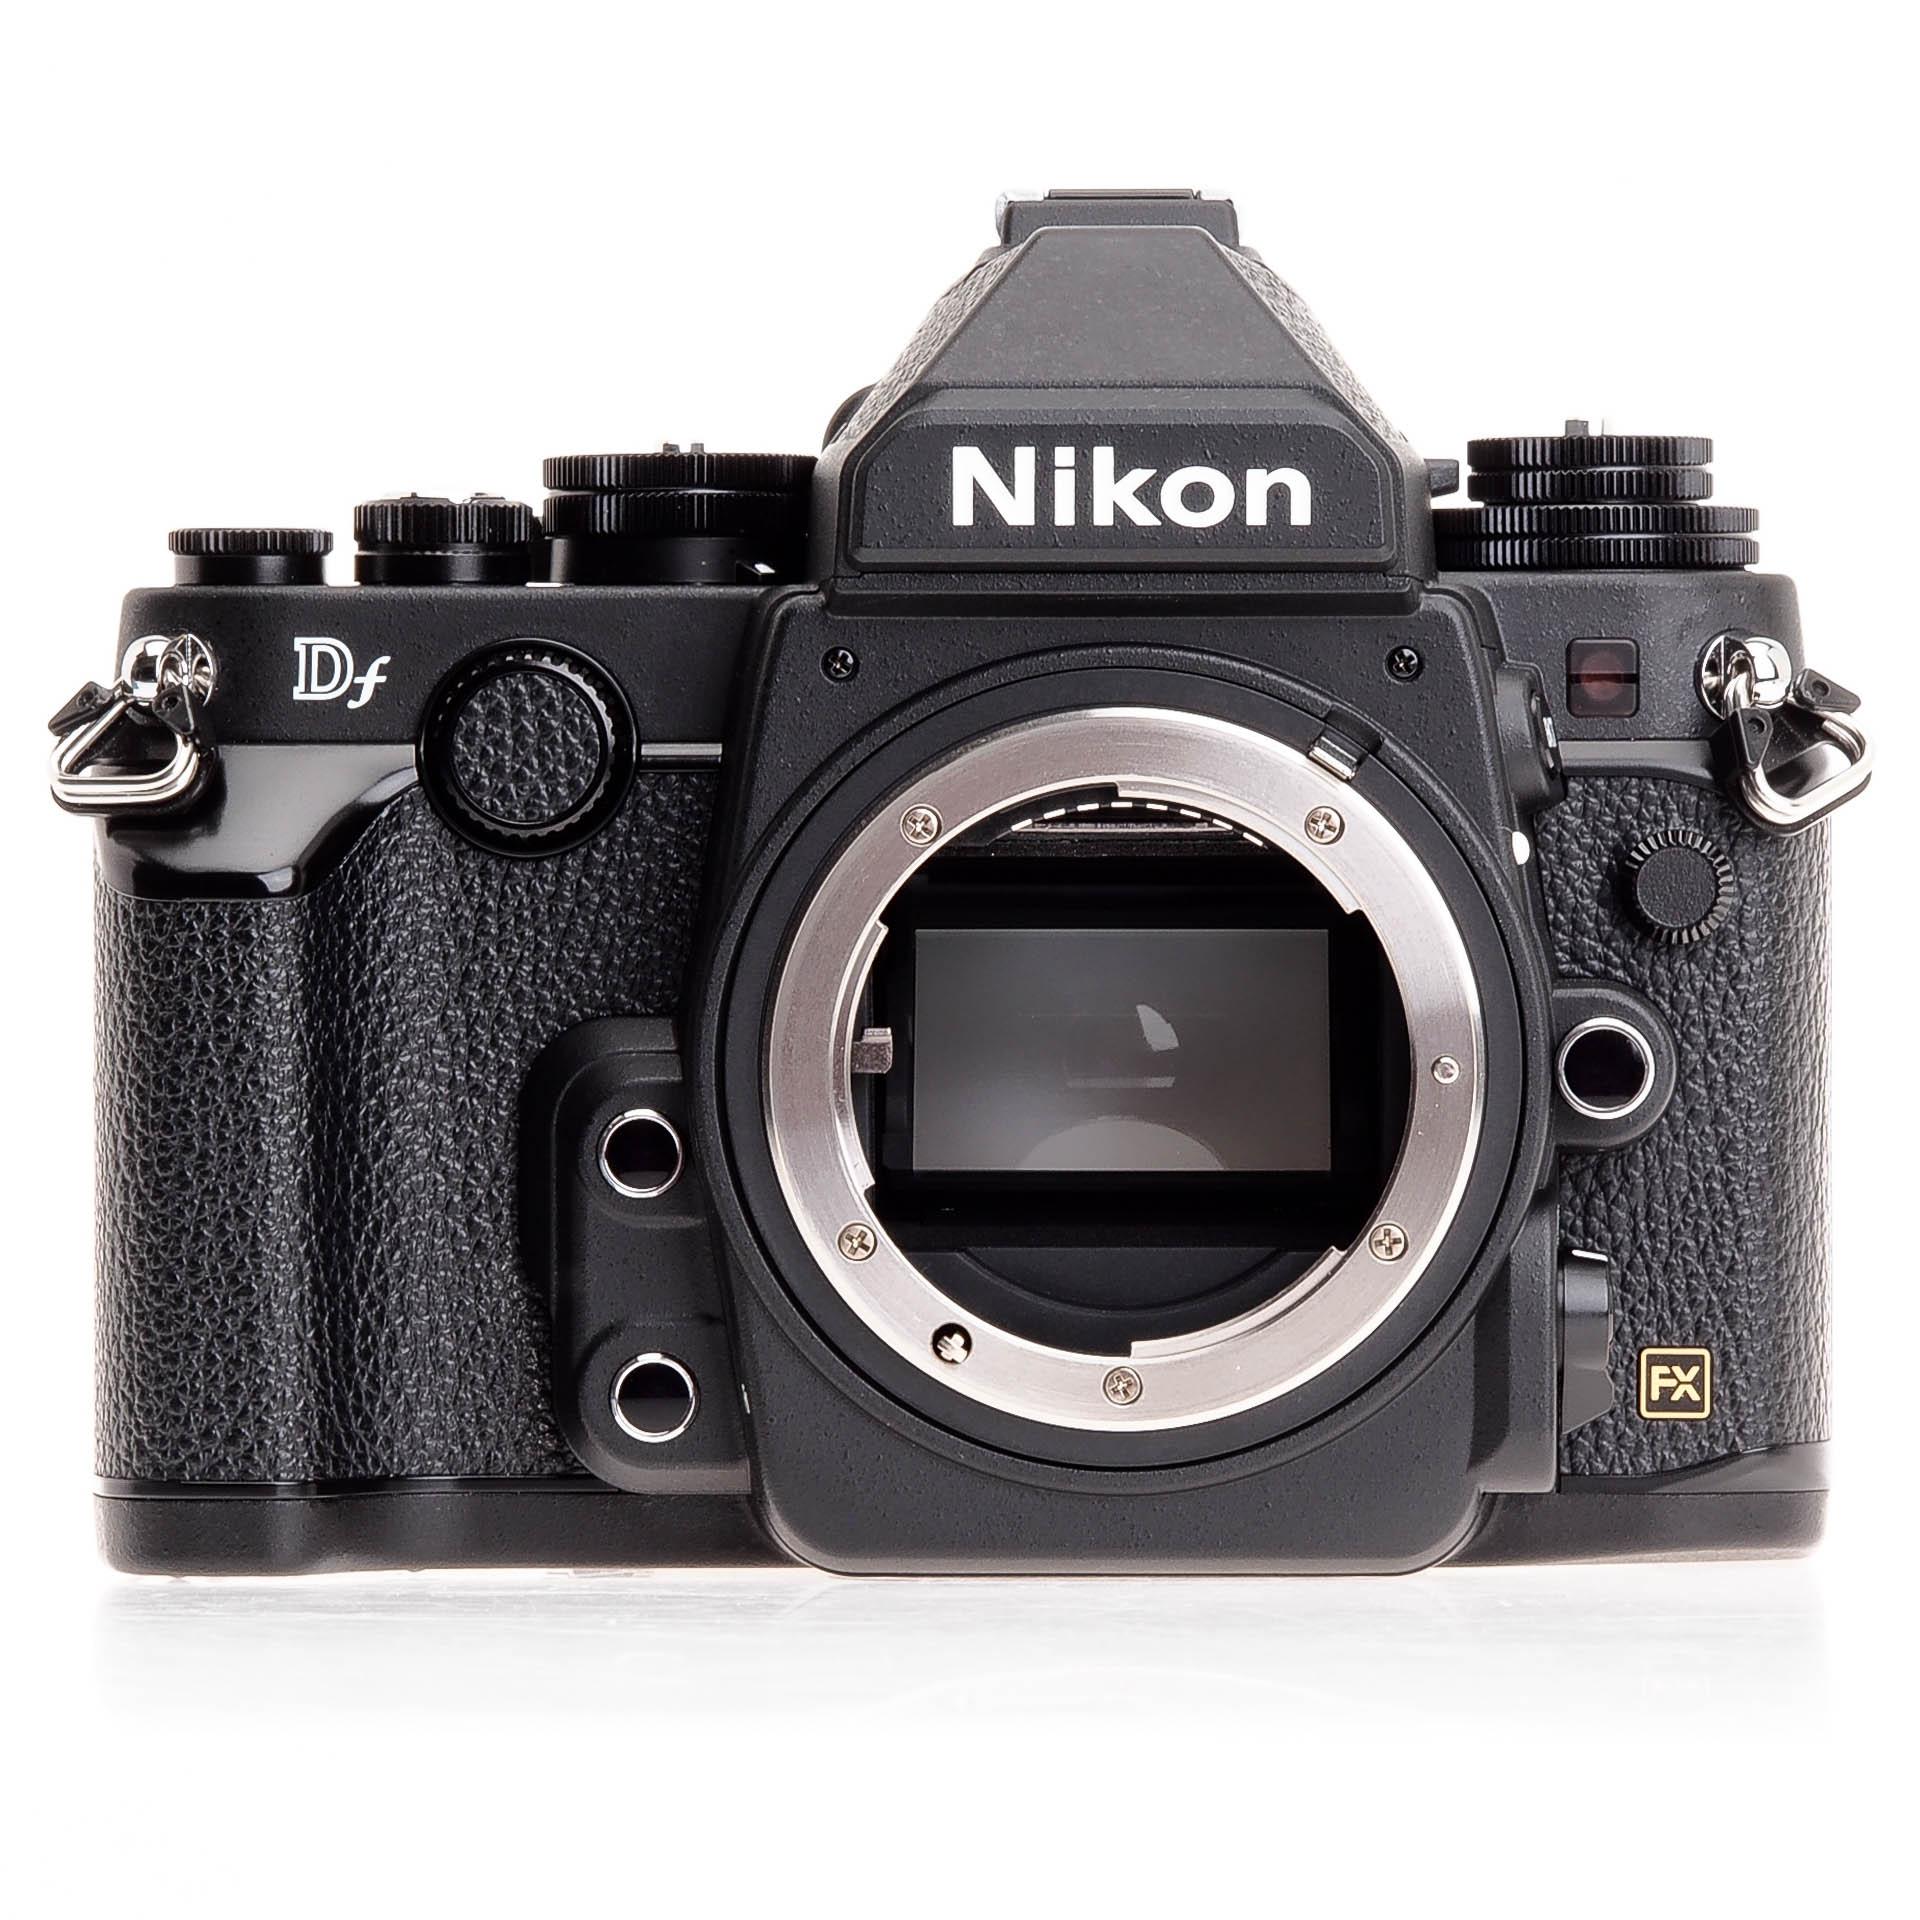 Nikon Df 16 2 MP FX Digital SLR Black Body 1525 Used Condition VG